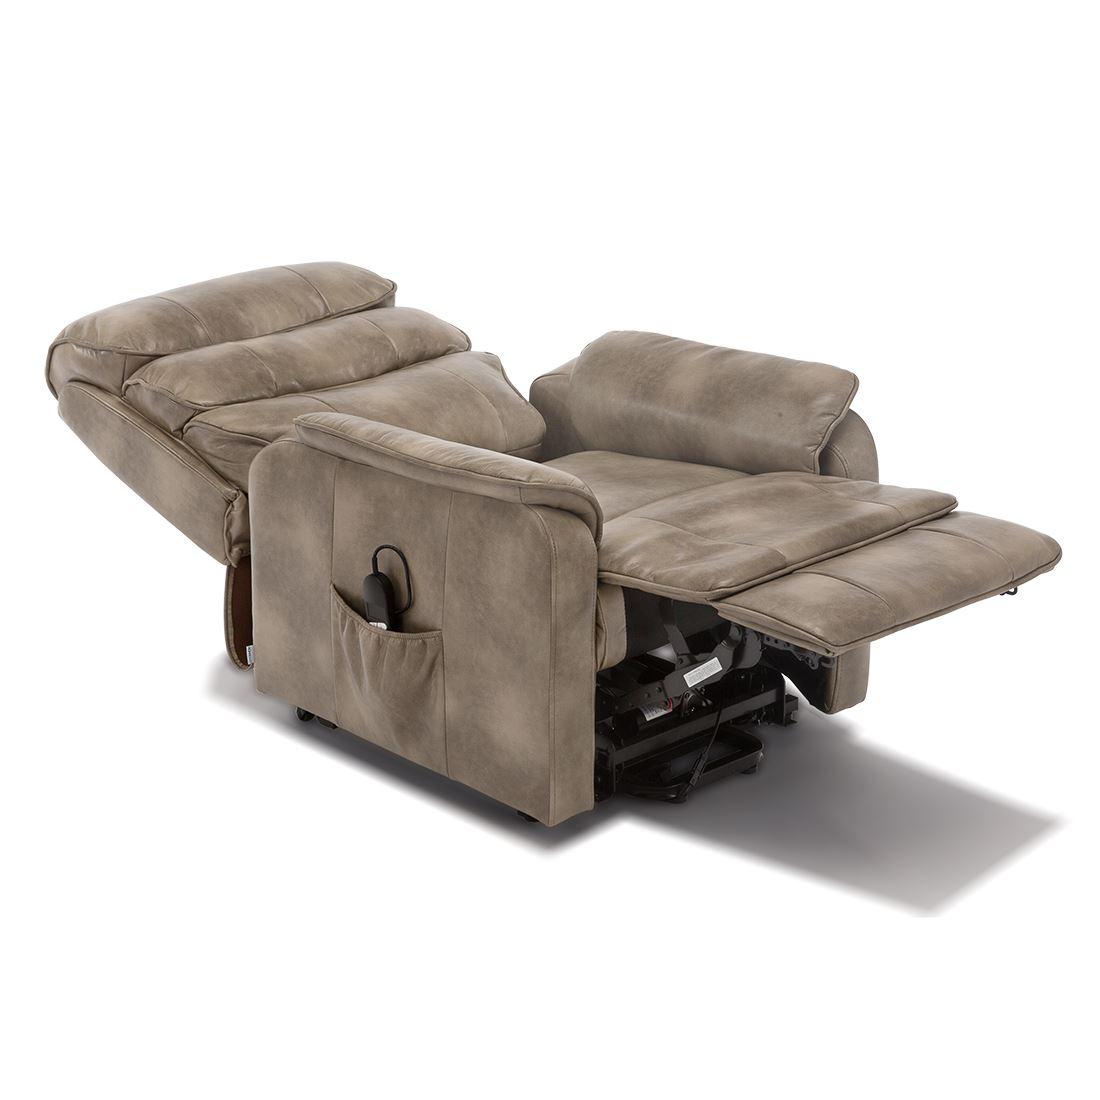 Buckingham Electric Rise Recliner Leather Air Riser Sofa